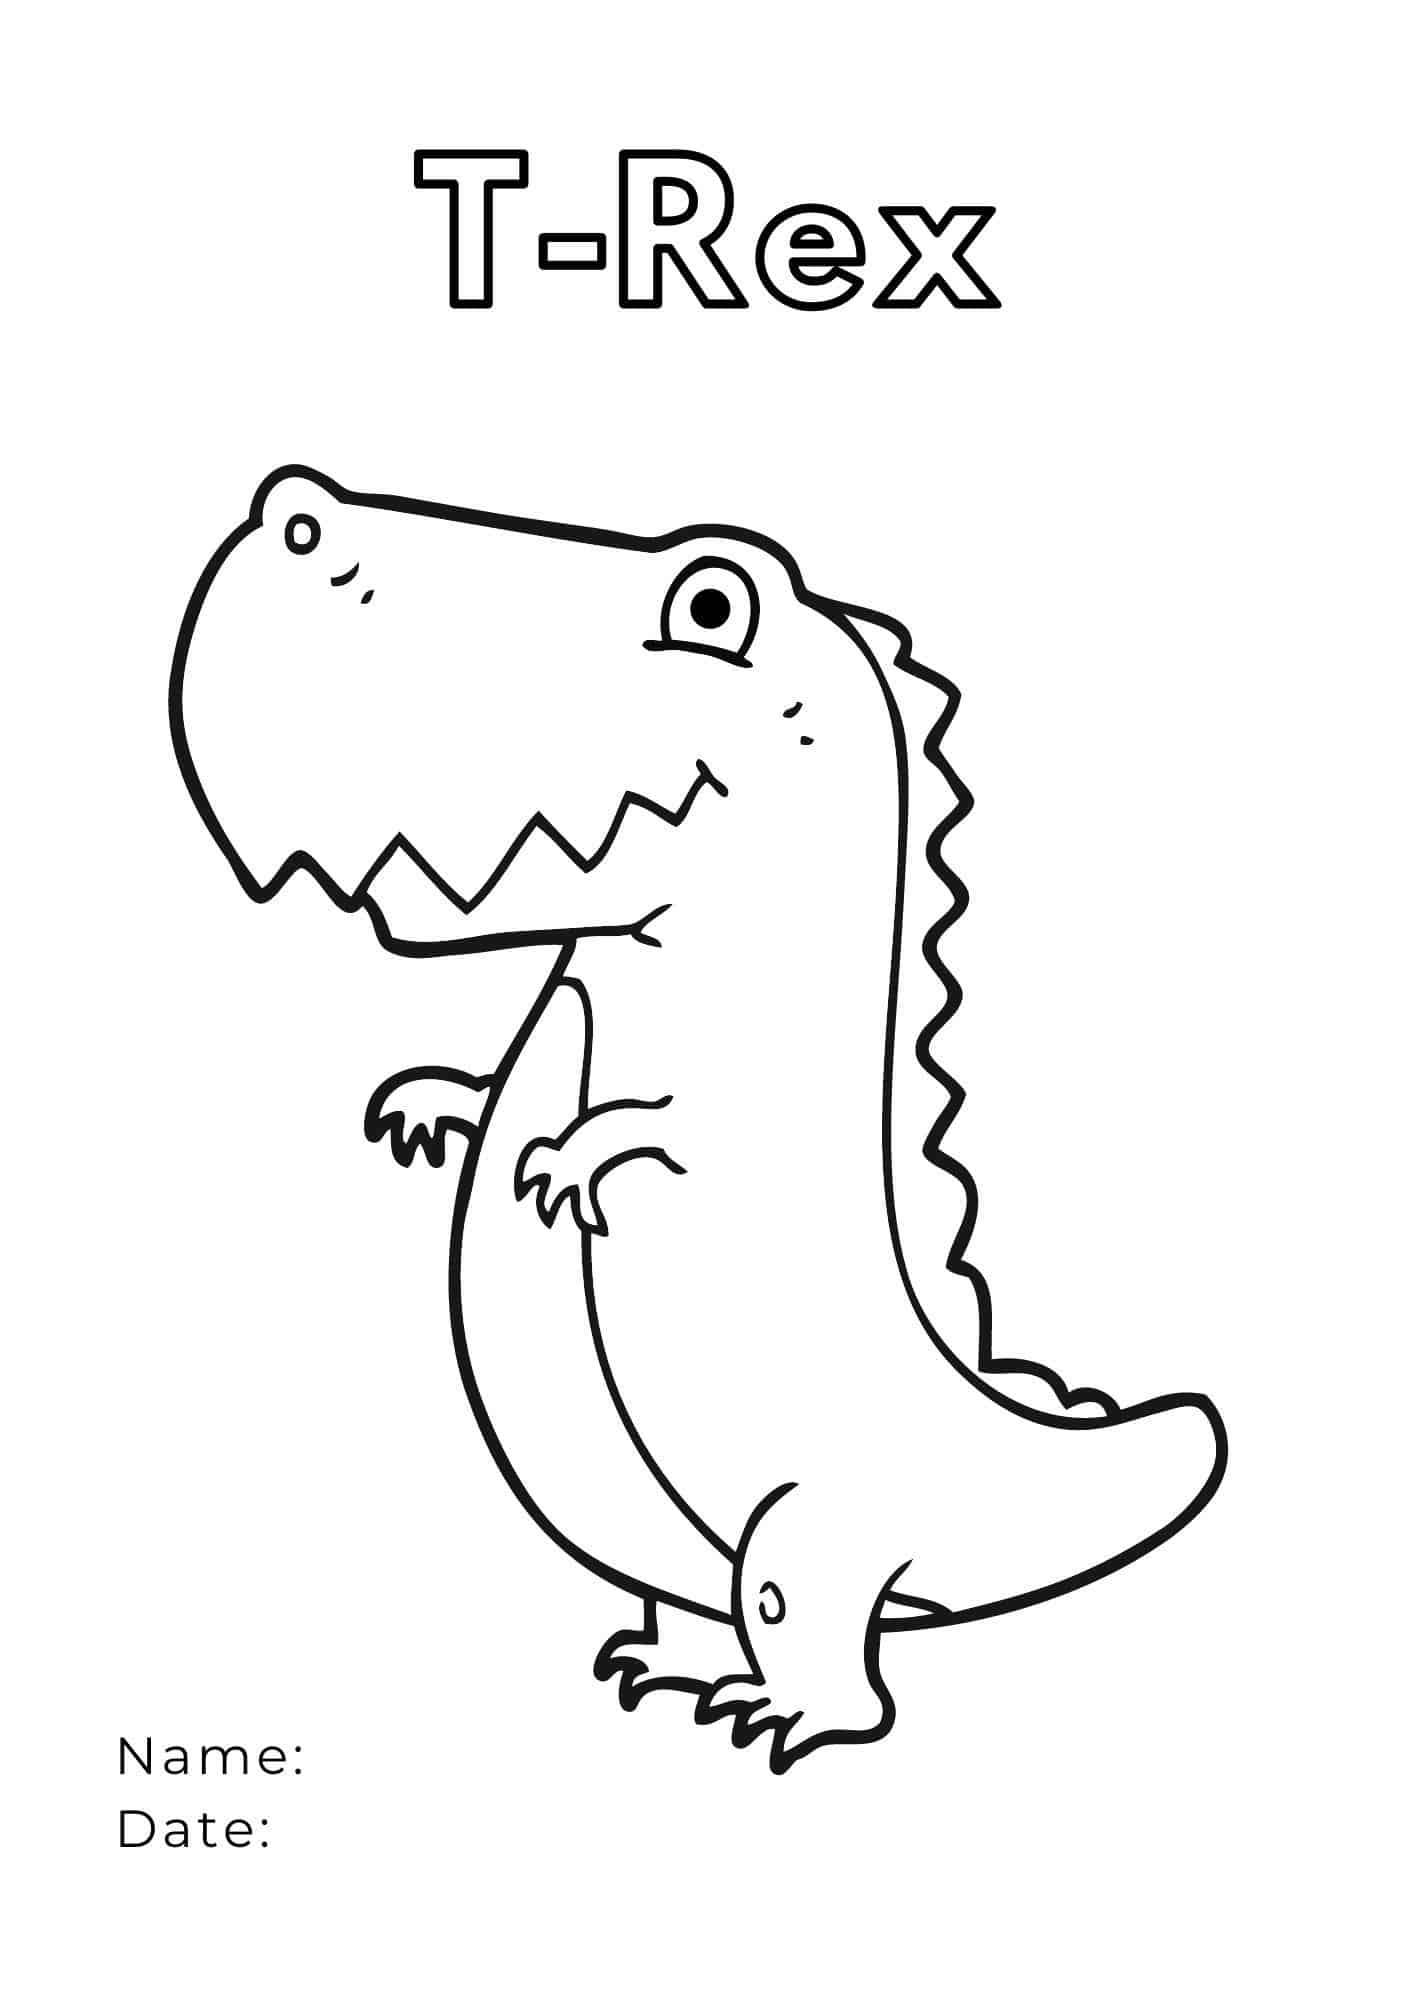 happy t-rex dino coloring page